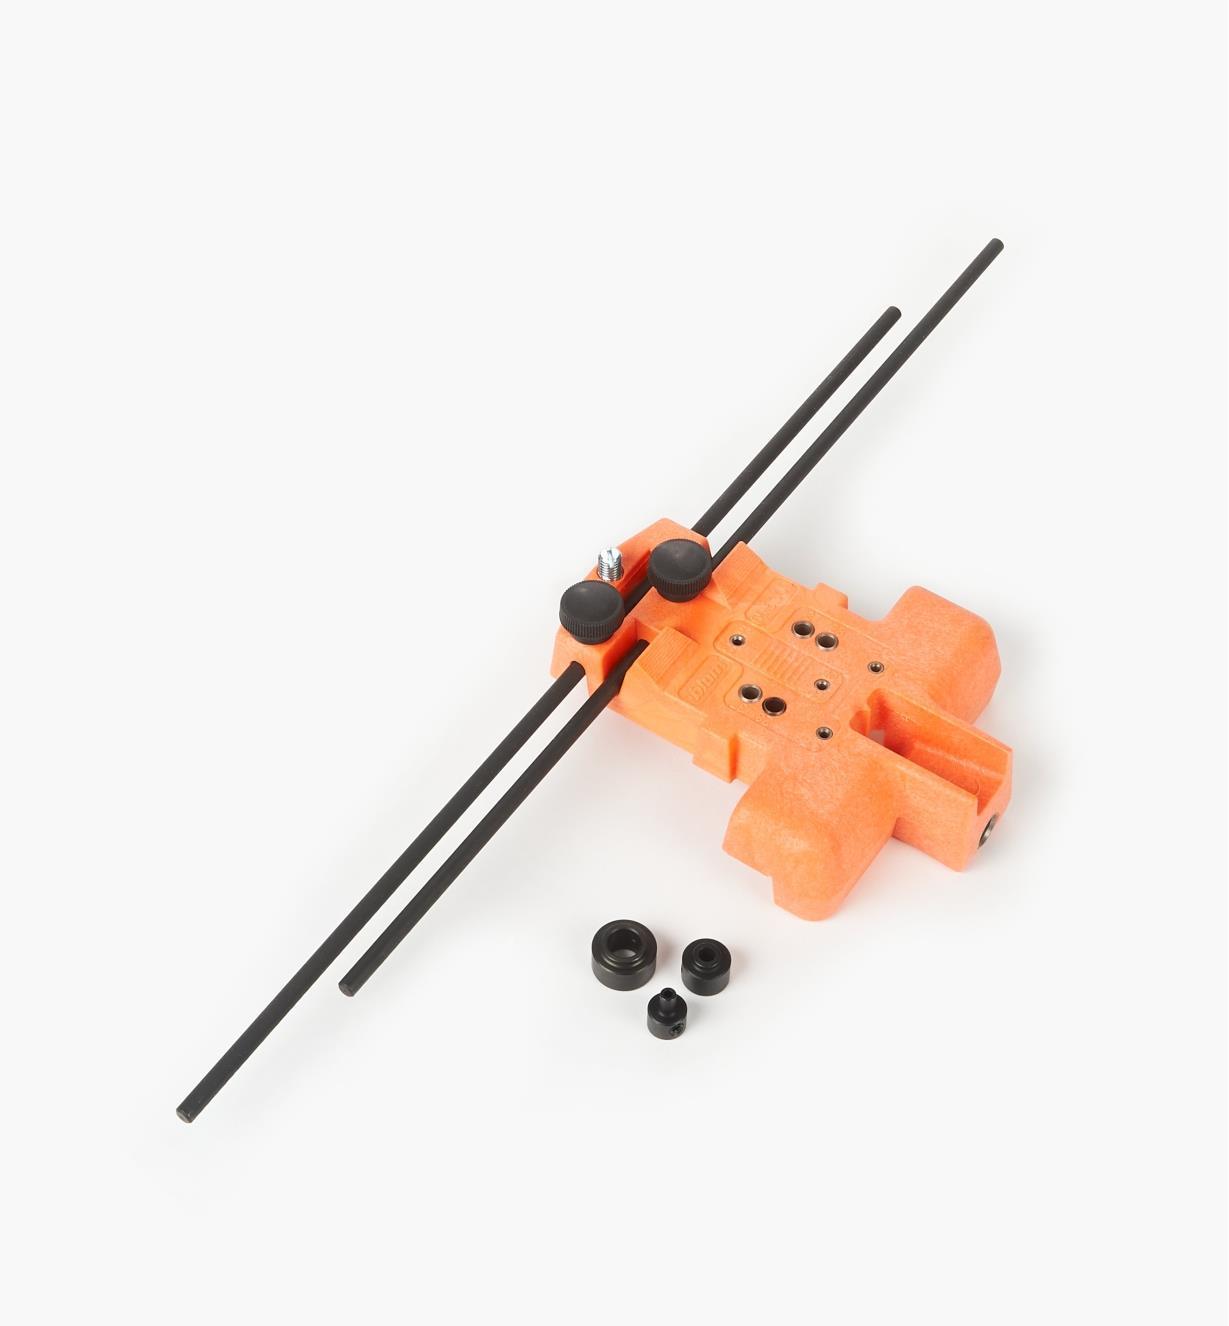 00B1750 - Pro Blumotion Drilling Jig